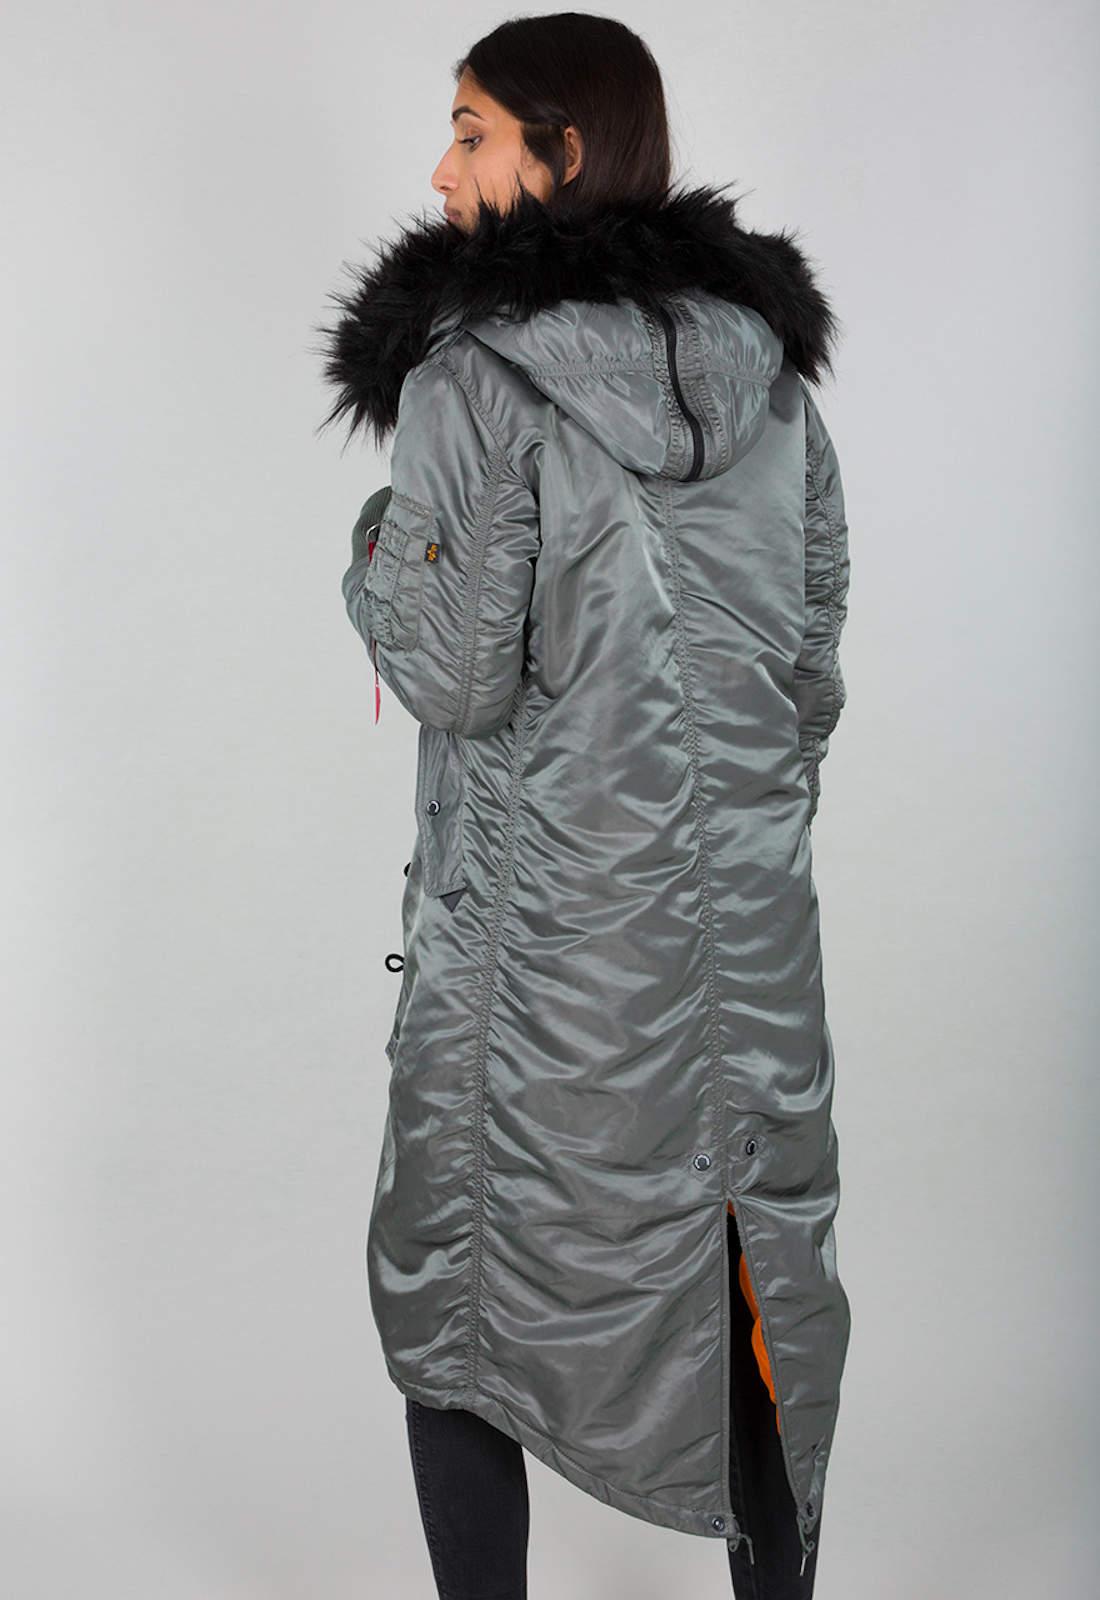 Details about Alpha Industries Damen Mantel B3FL Coat Winterjacke Parka Long Fishtail